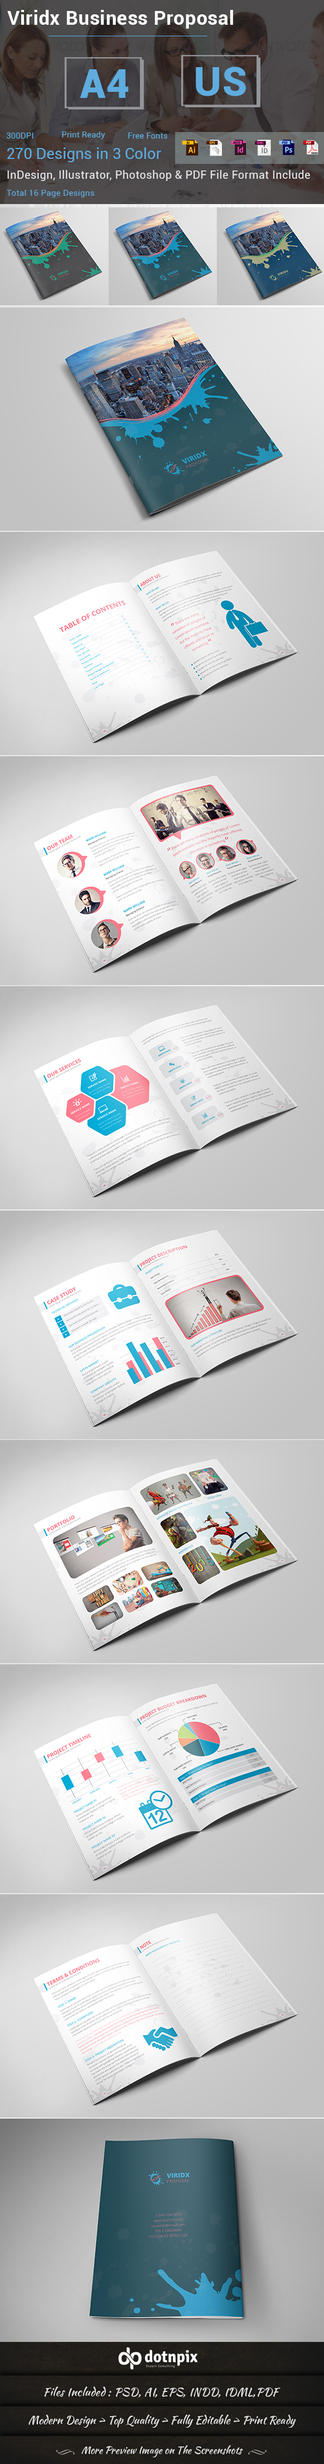 Viridx Business Proposal by dotnpix